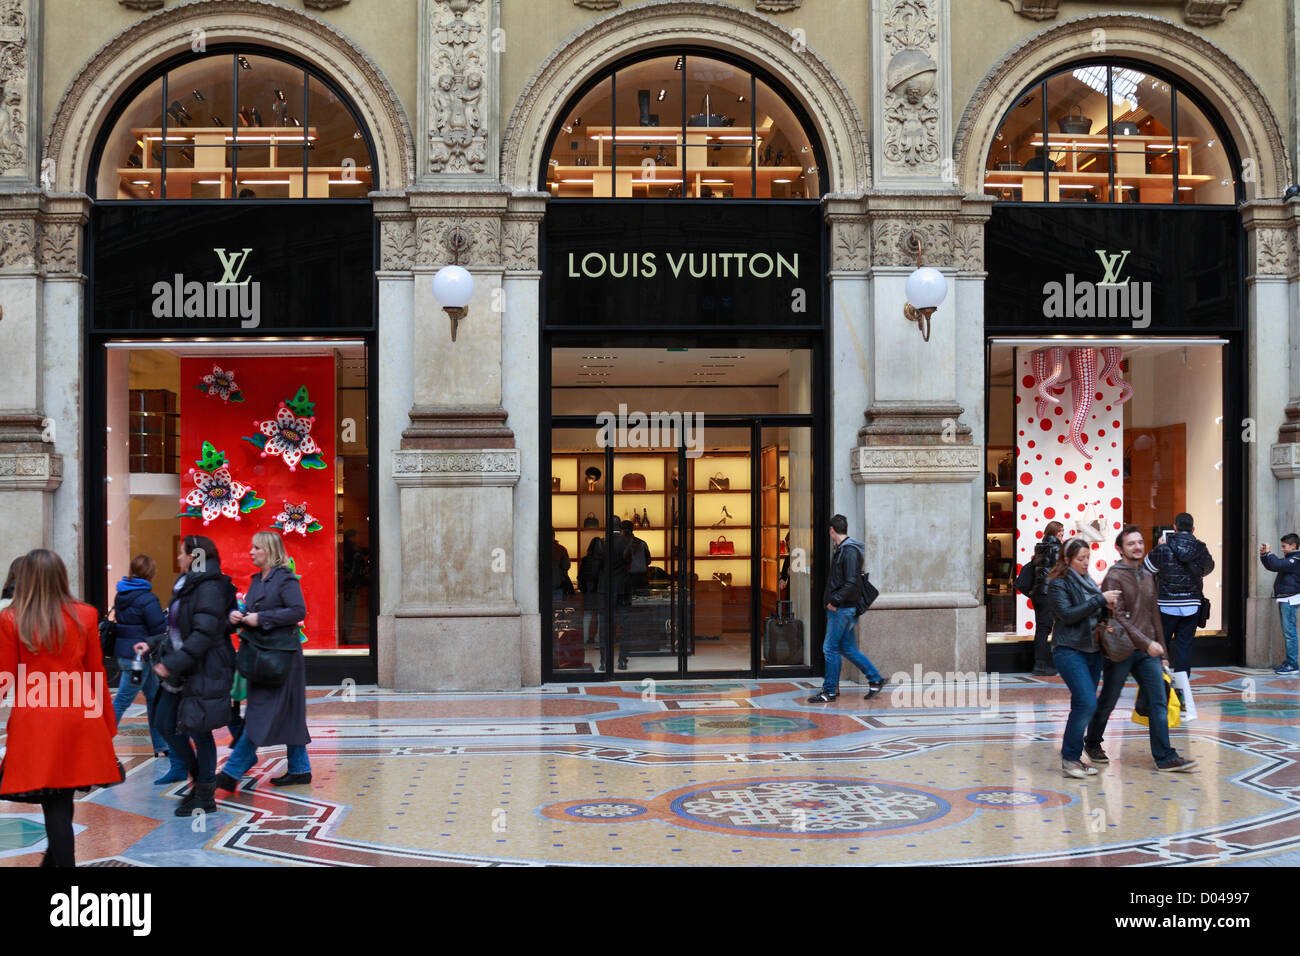 Louis Vuitton Store Galleria Vittorio Emanuele Ii Milan Italy Europe